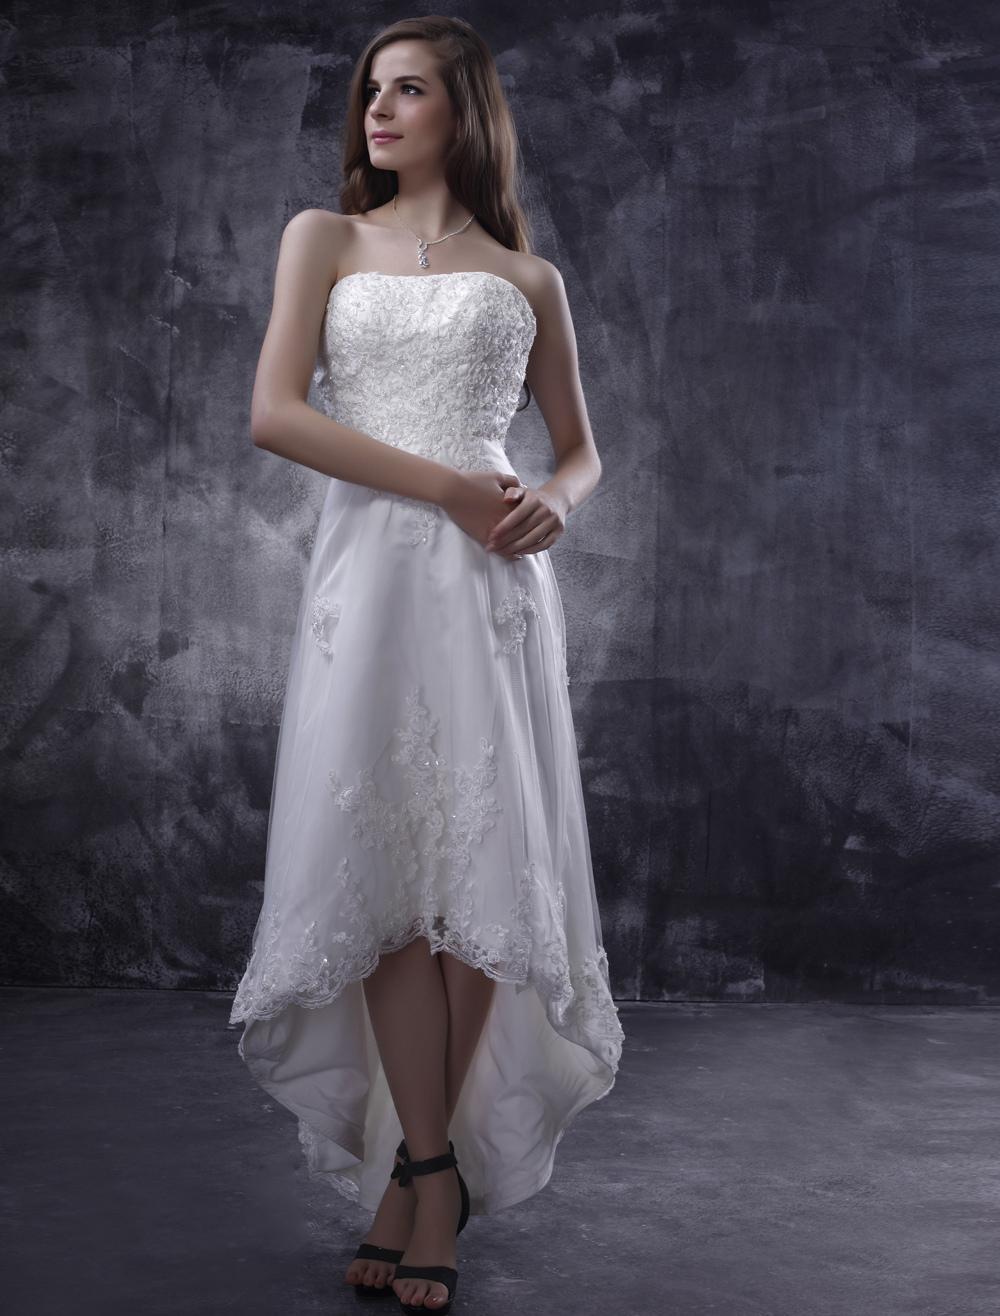 short wedding dresses 2018 lace strapless beaded Asymmetrical White summer beach Bridal Dress (Cheap Wedding Dress) photo